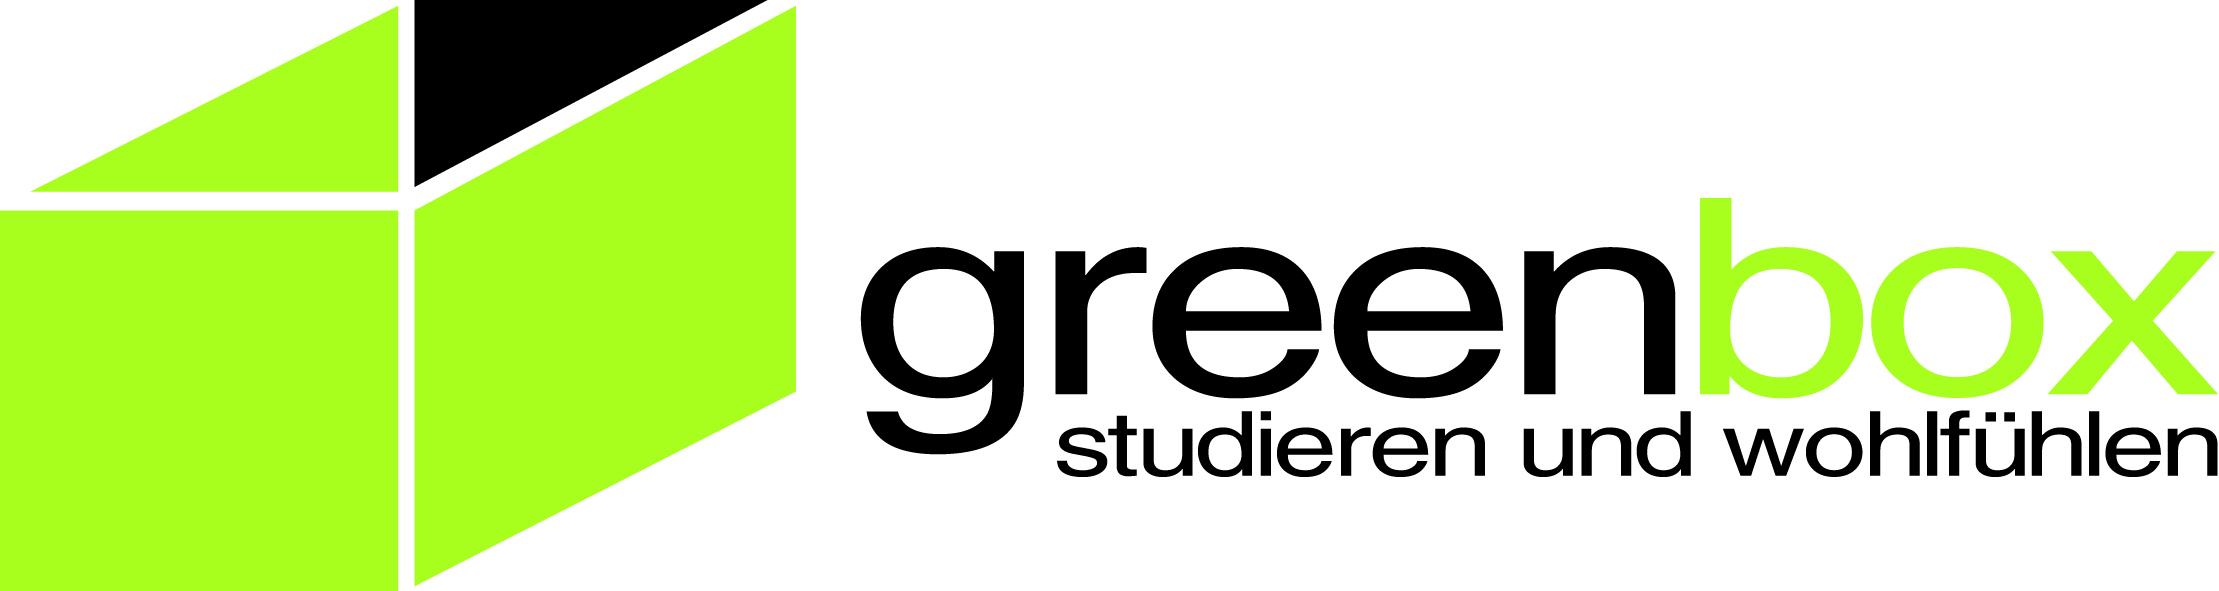 Greenbox Studentenheime